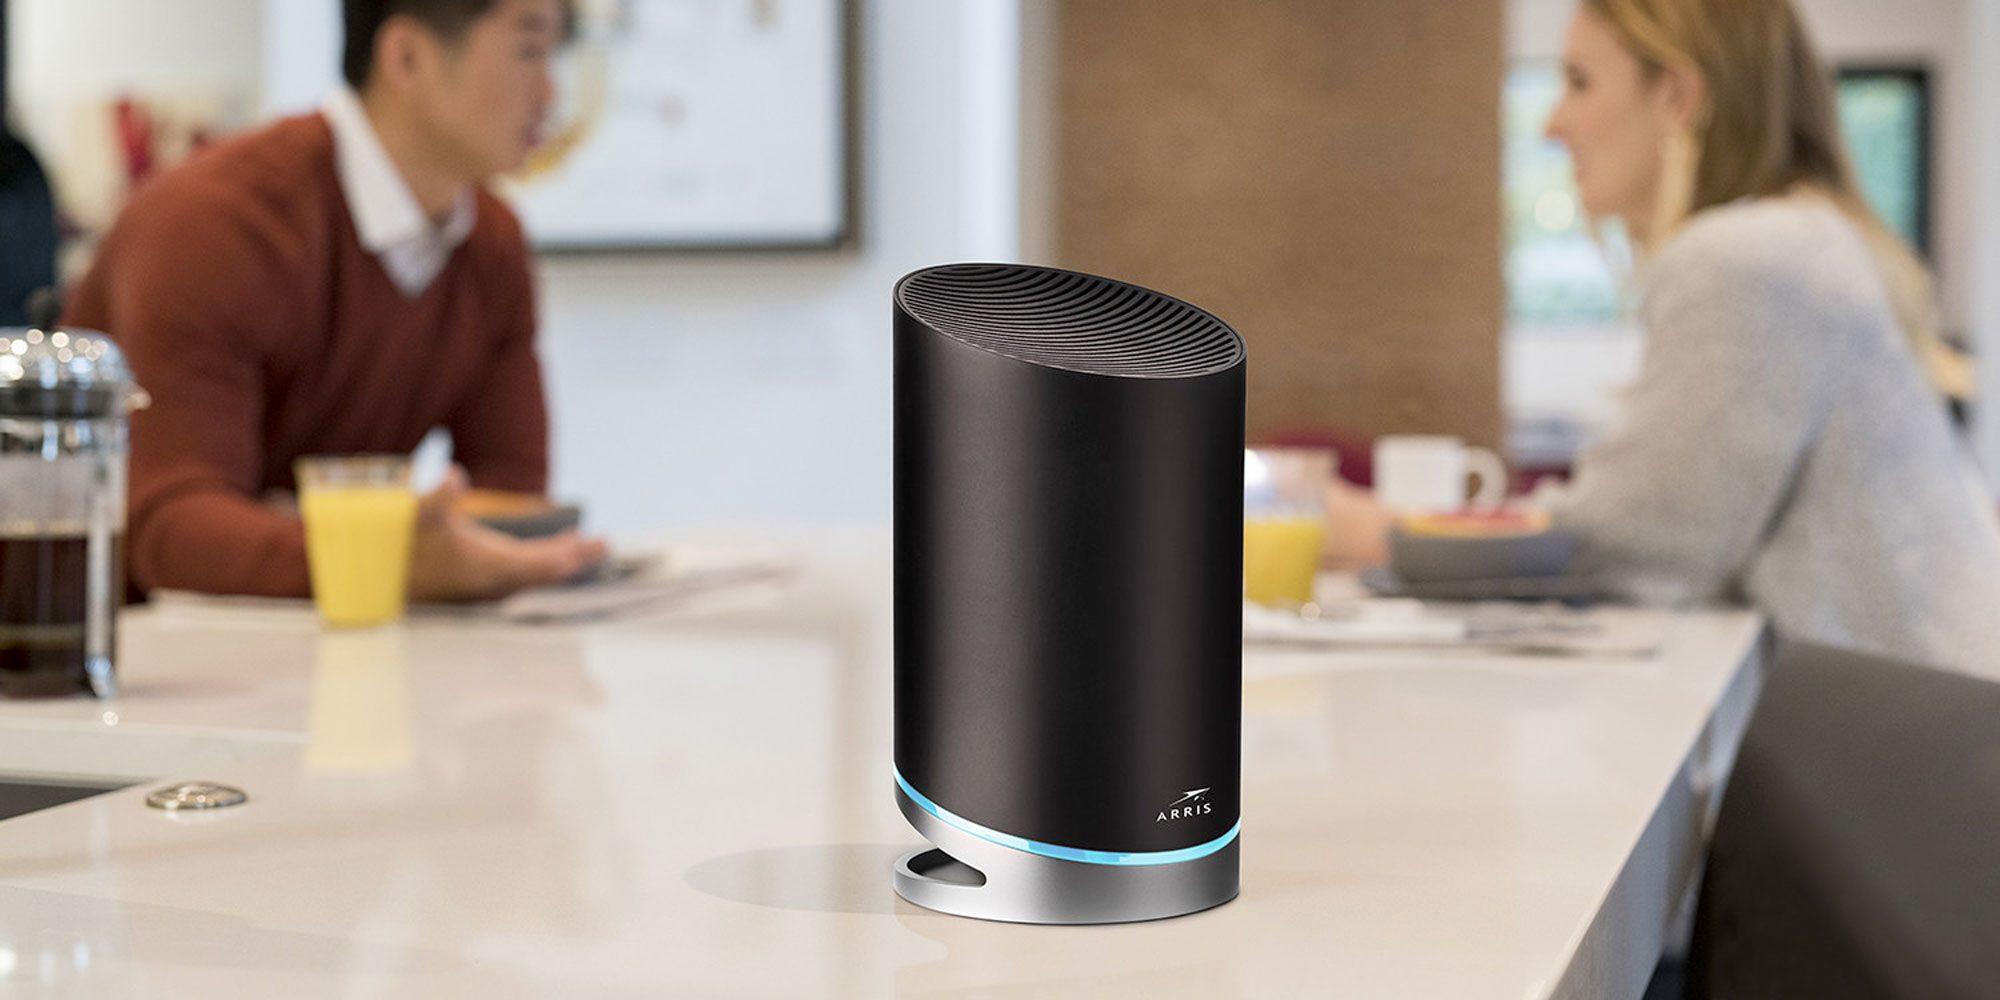 9to5Toys Letzter Anruf: Nest Google Home bündelt bis zu 40% TCL Roku UHDTV $ 500, WD 8 TB Desktop HDD $ 130, mehr